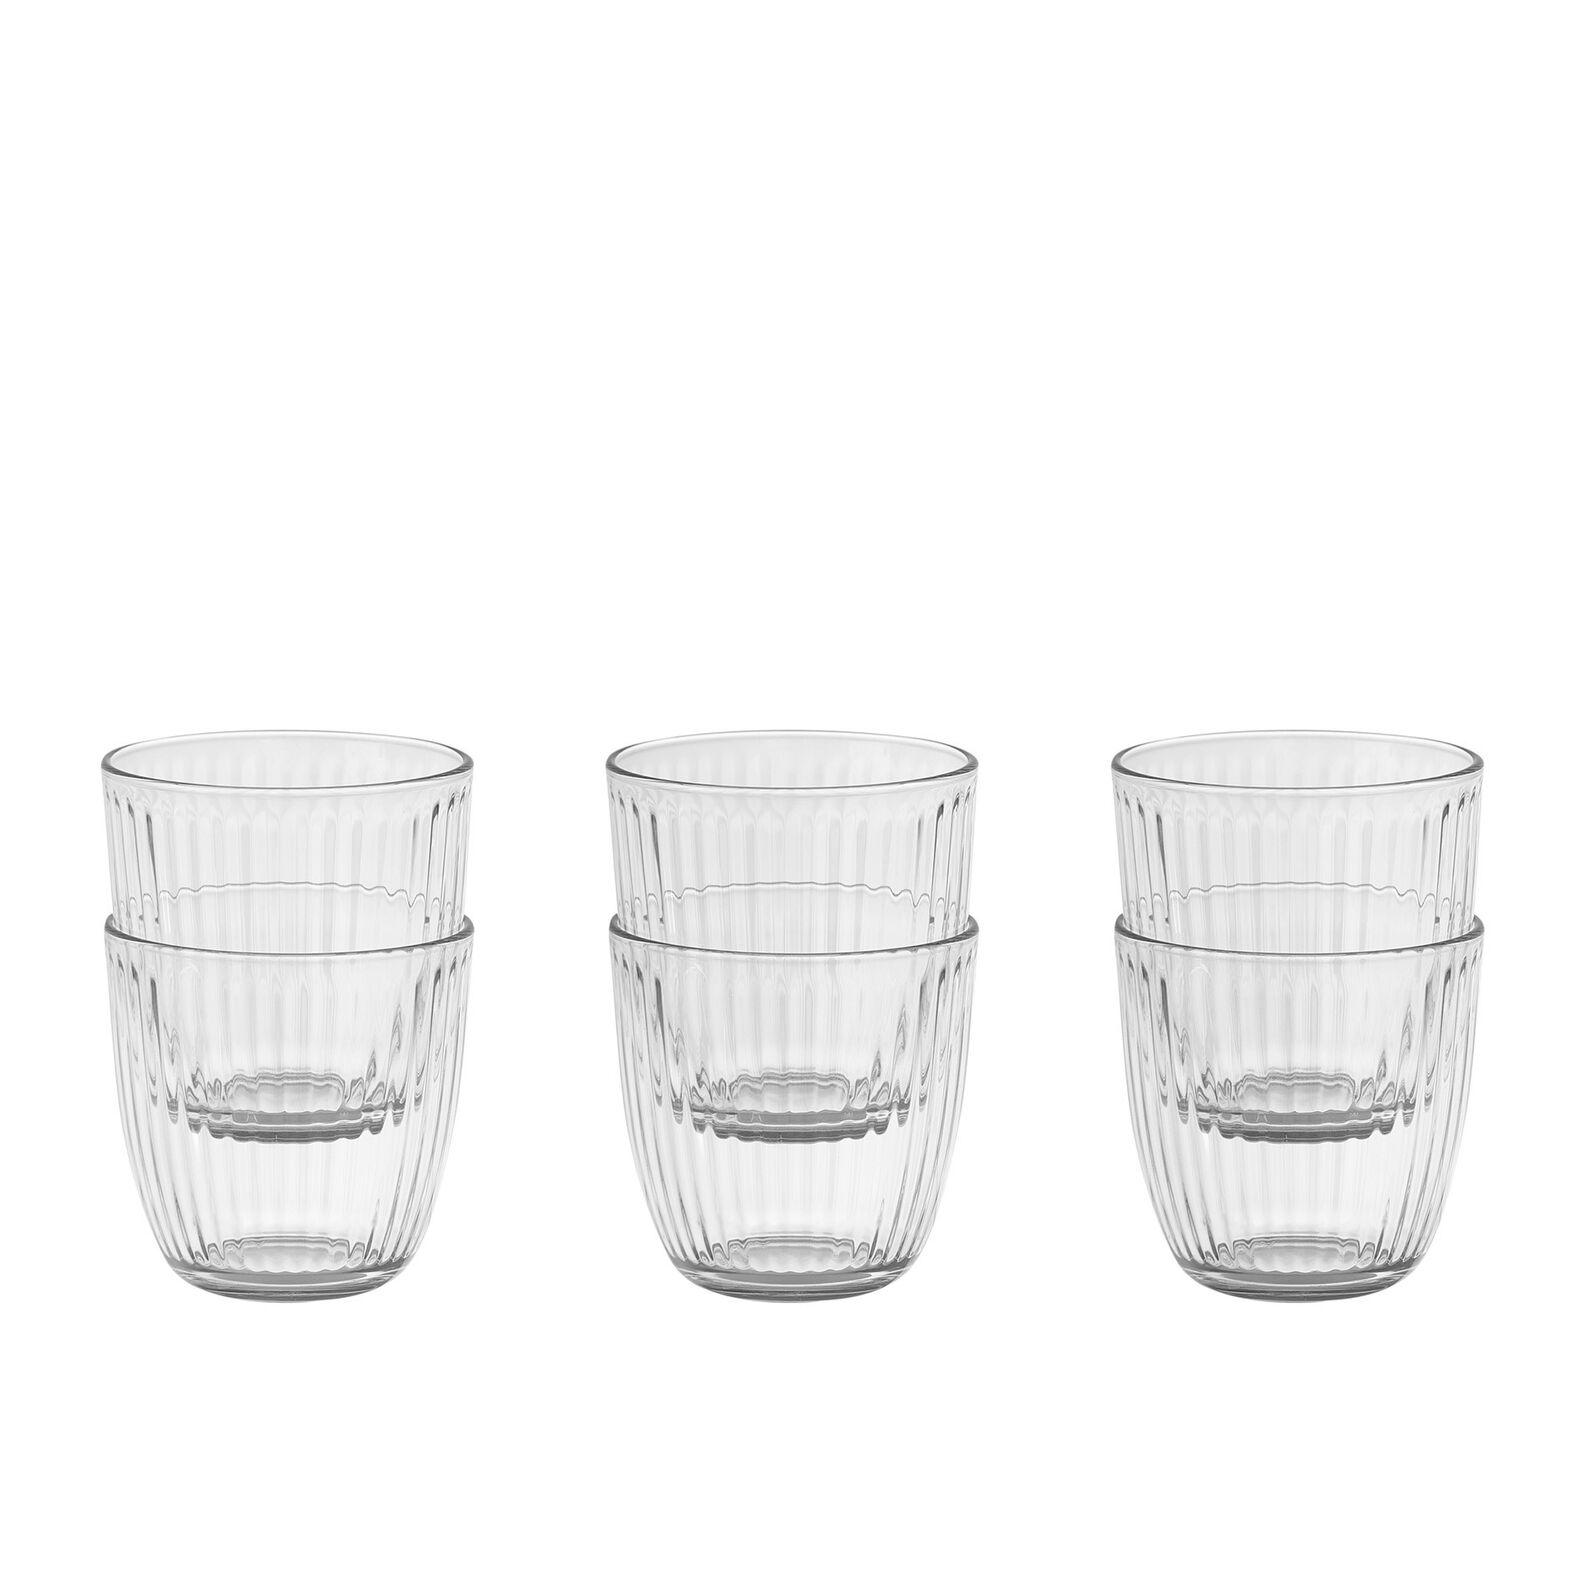 Set of 6 transparent glass tumblers